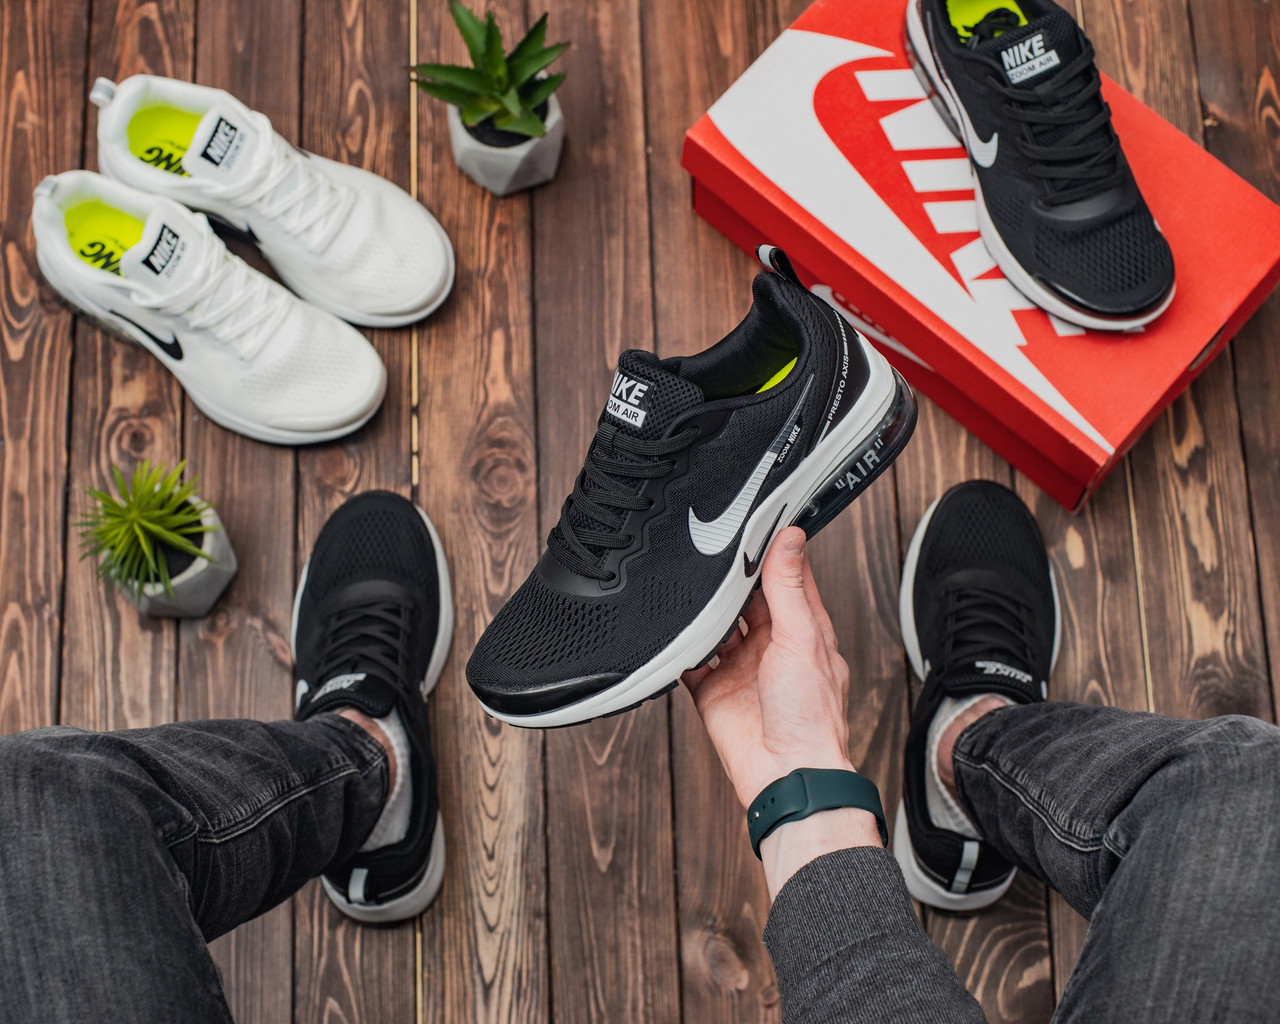 Мужские кроссовки Nike Air Presto AXIS Black-White Реплика